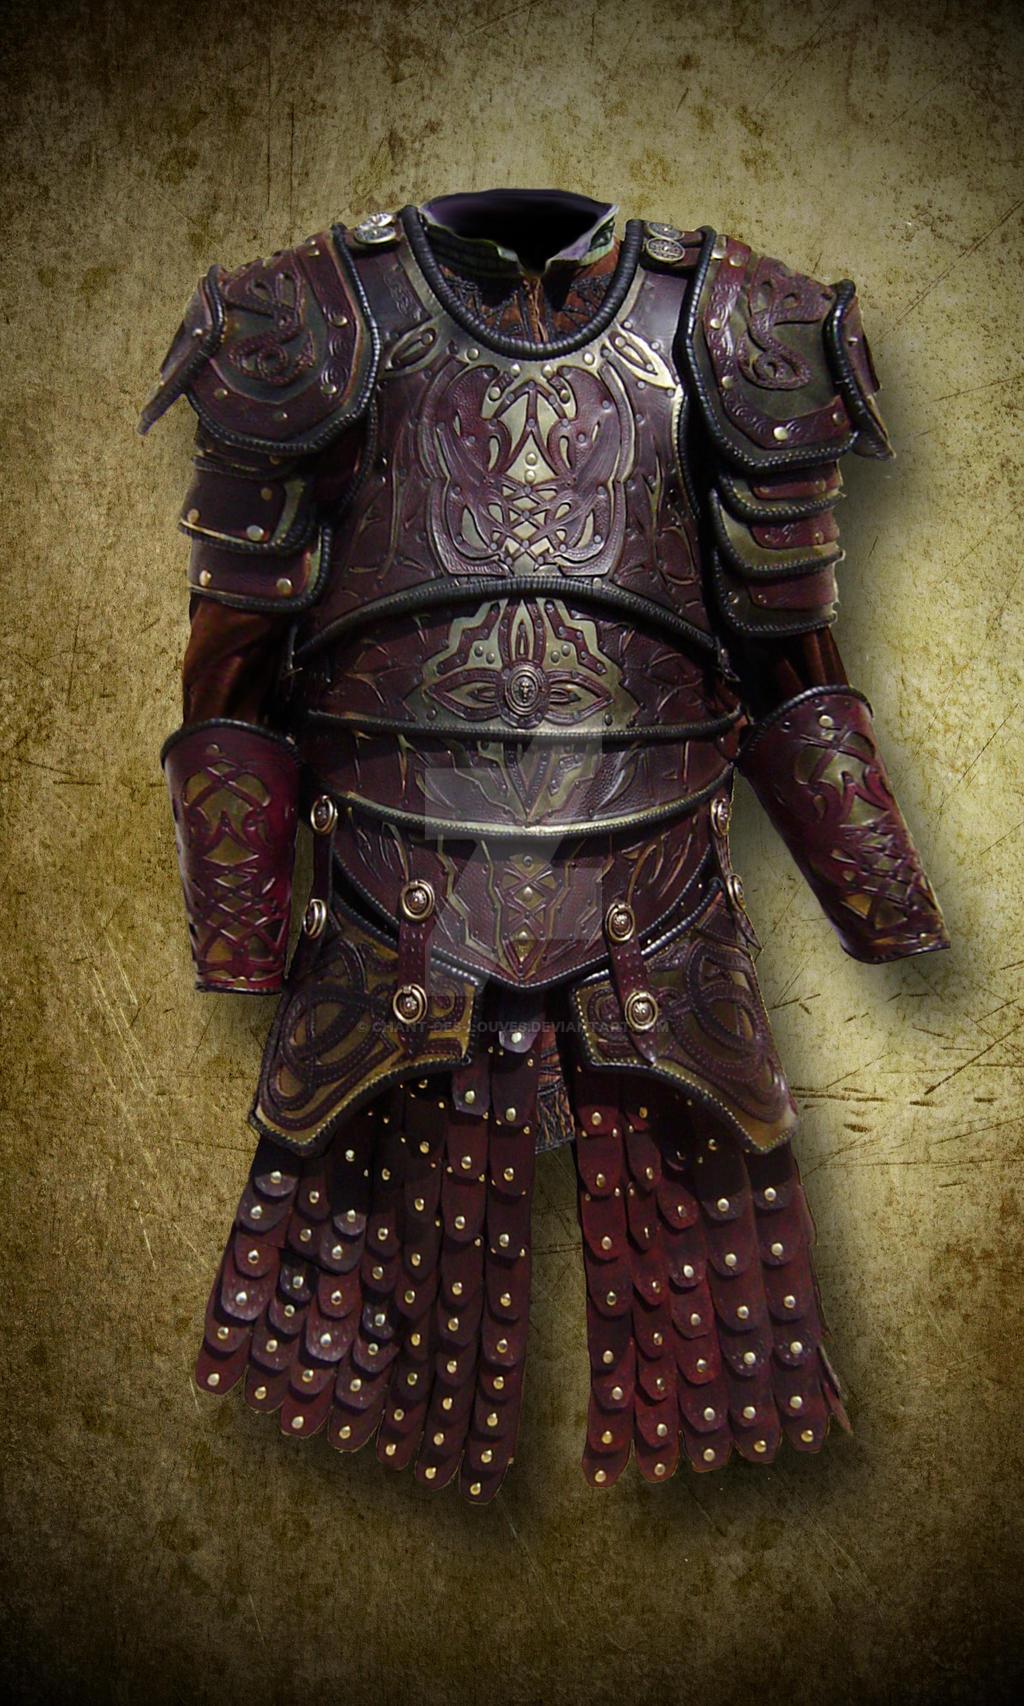 Karuna's armor